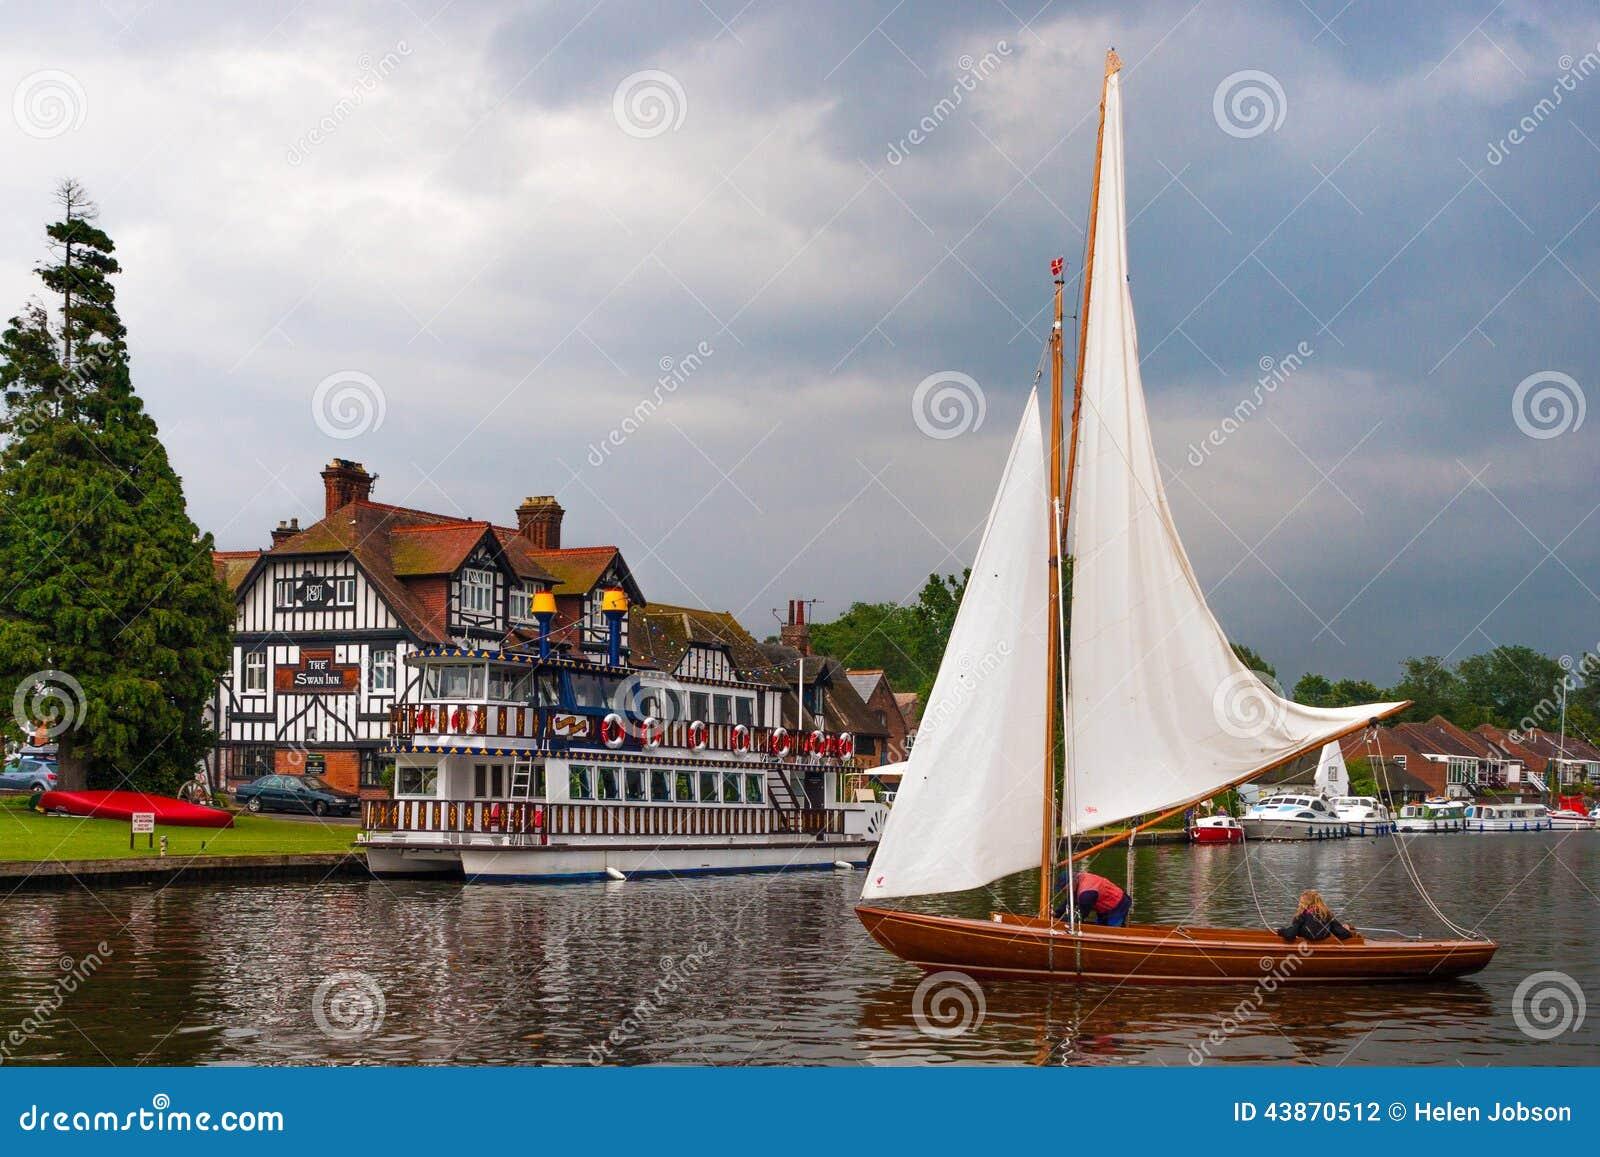 Swan Inn Sail Boat 0320 Editorial Photography Image